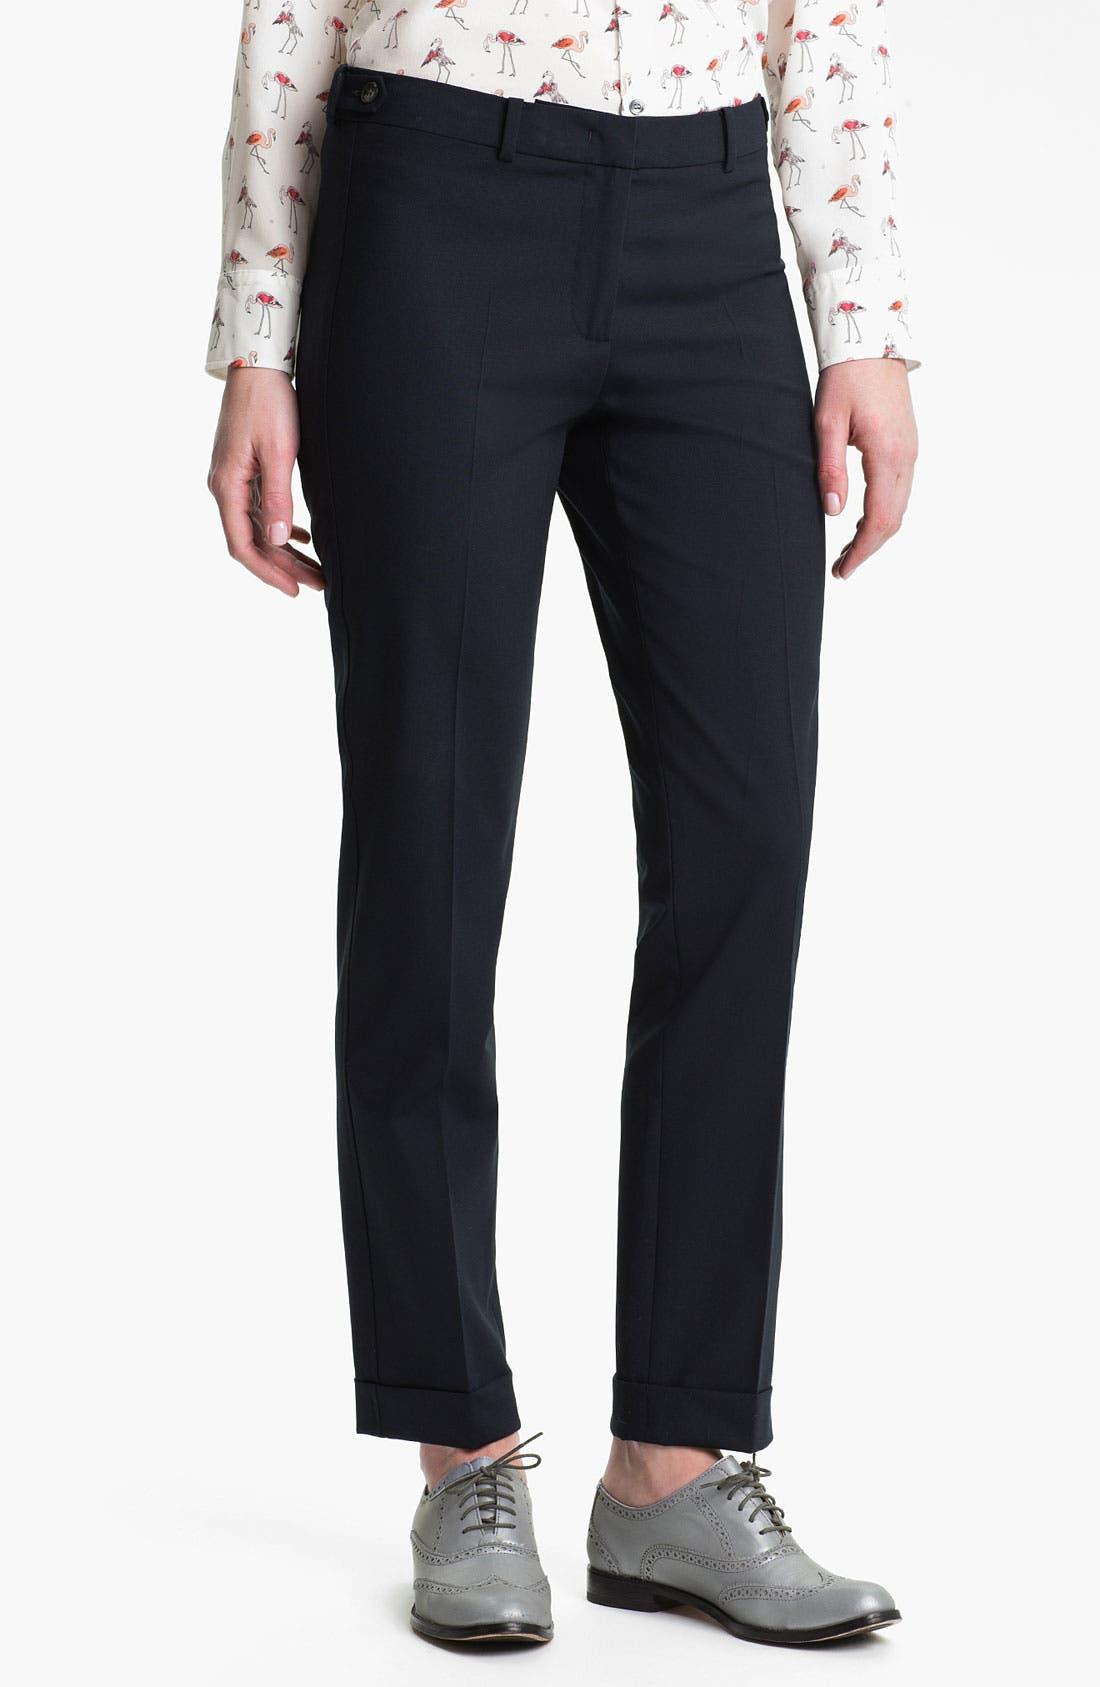 Alternate Image 1 Selected - Weekend Max Mara 'Oscuro' Stretch Wool Pants